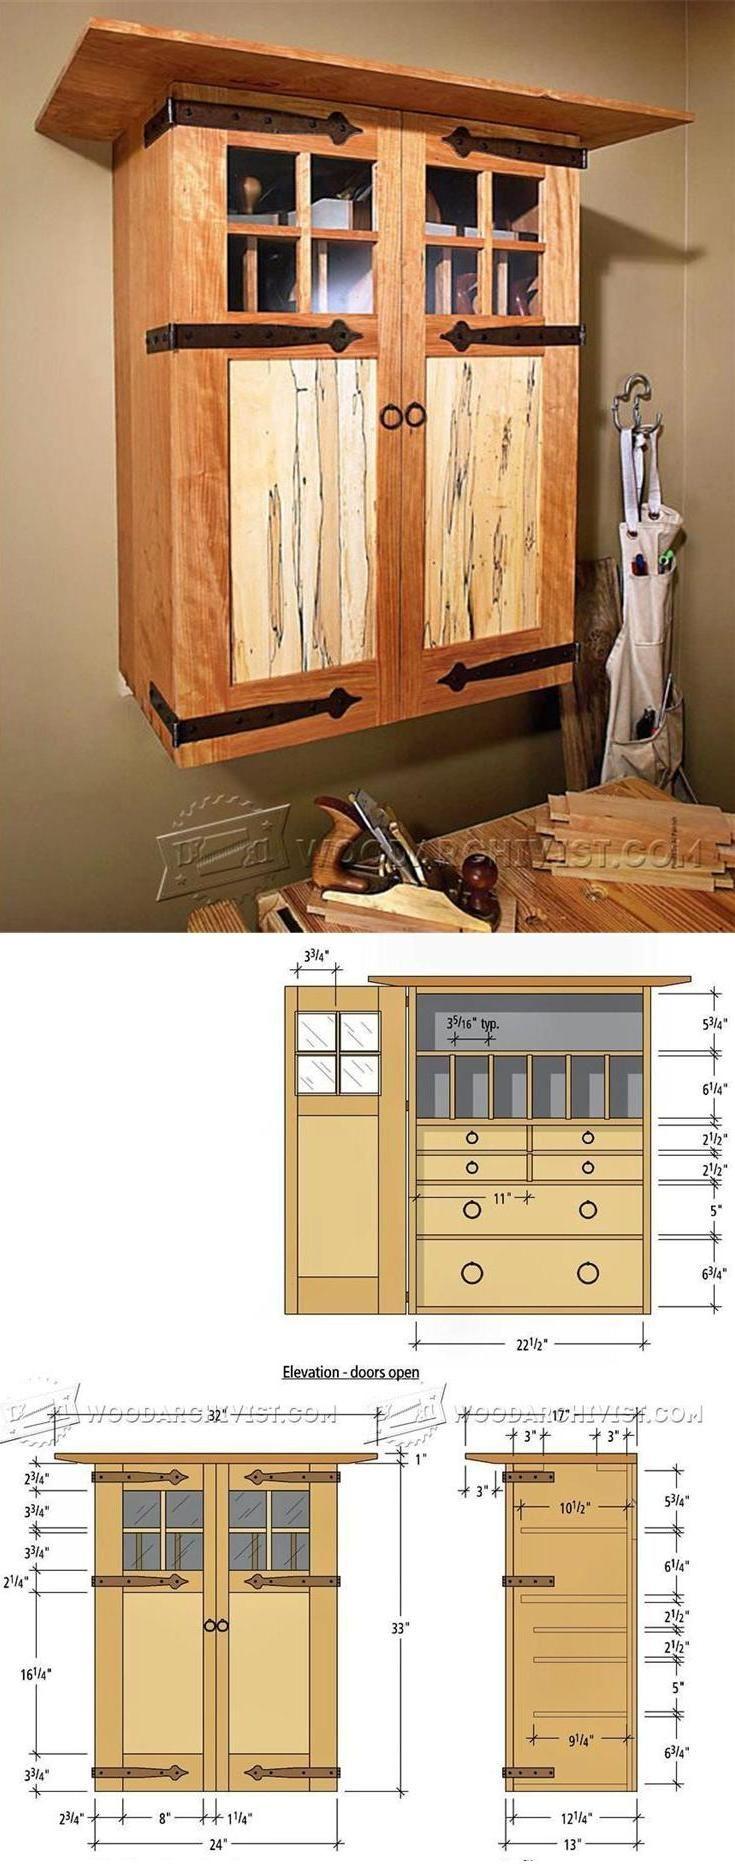 Workshop Cabinets Diy 25 Best Ideas About Workshop Cabinets On Pinterest Garage